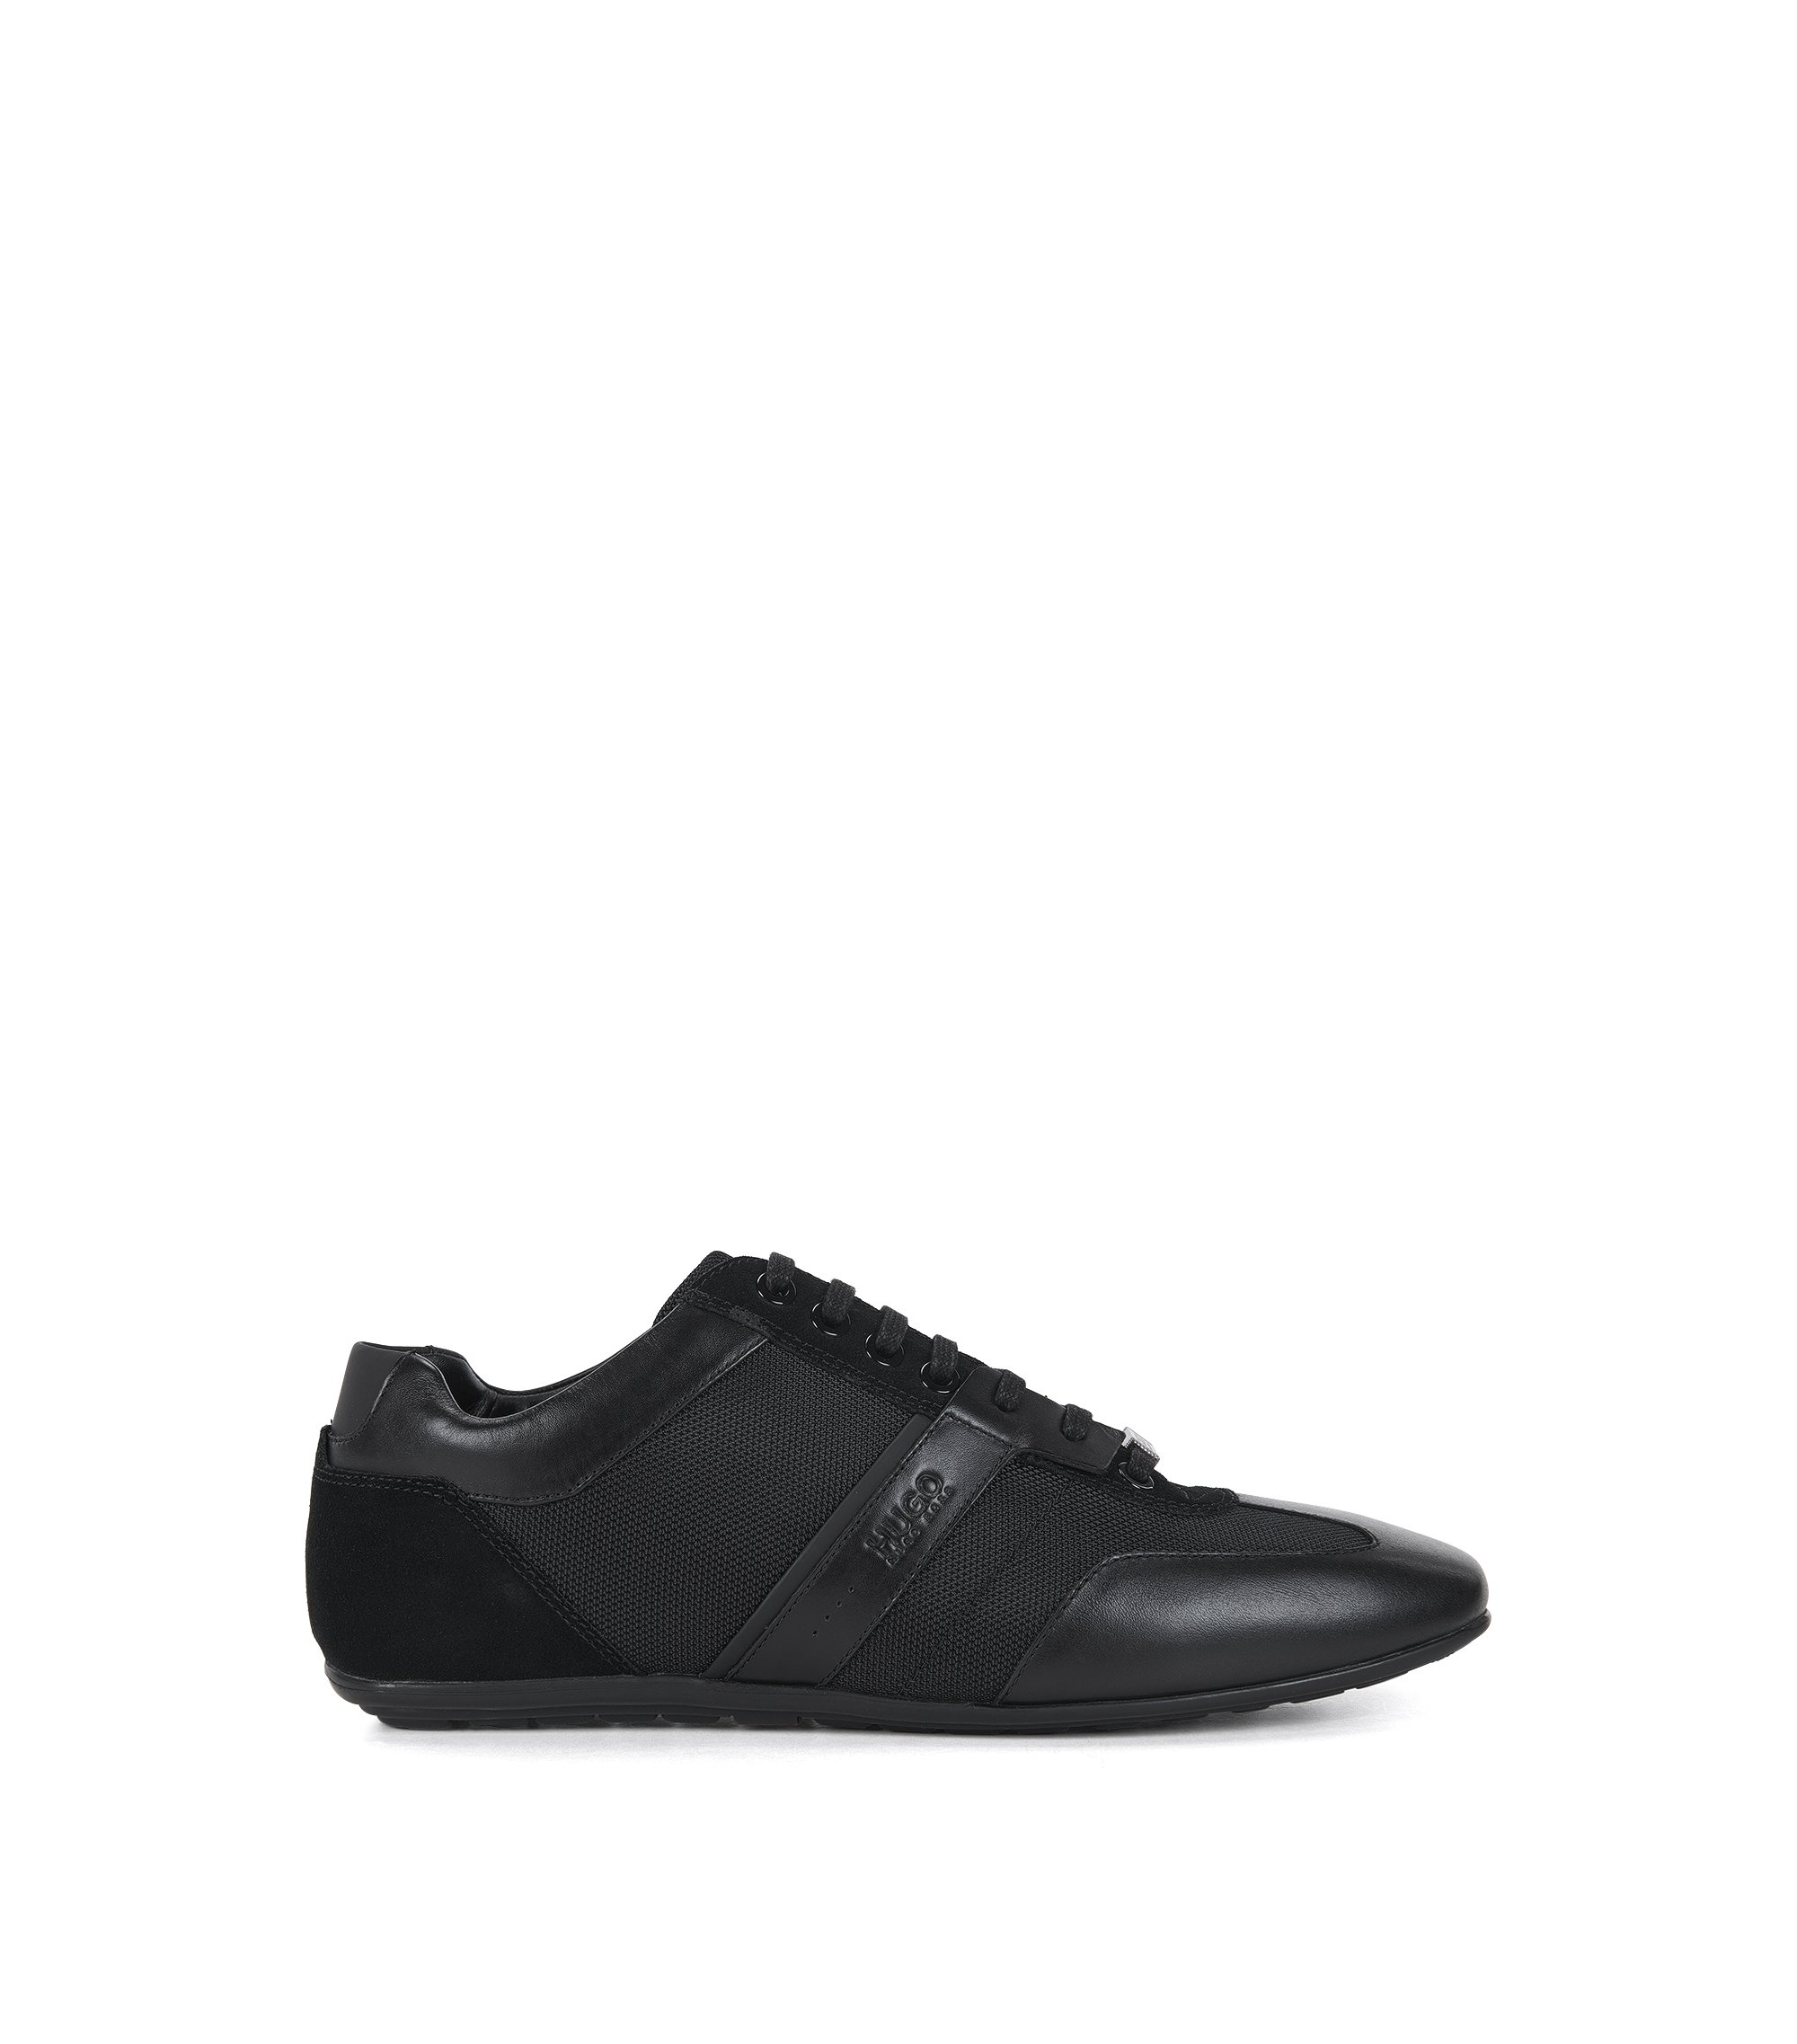 Sneakers mit Leder-Details, Schwarz